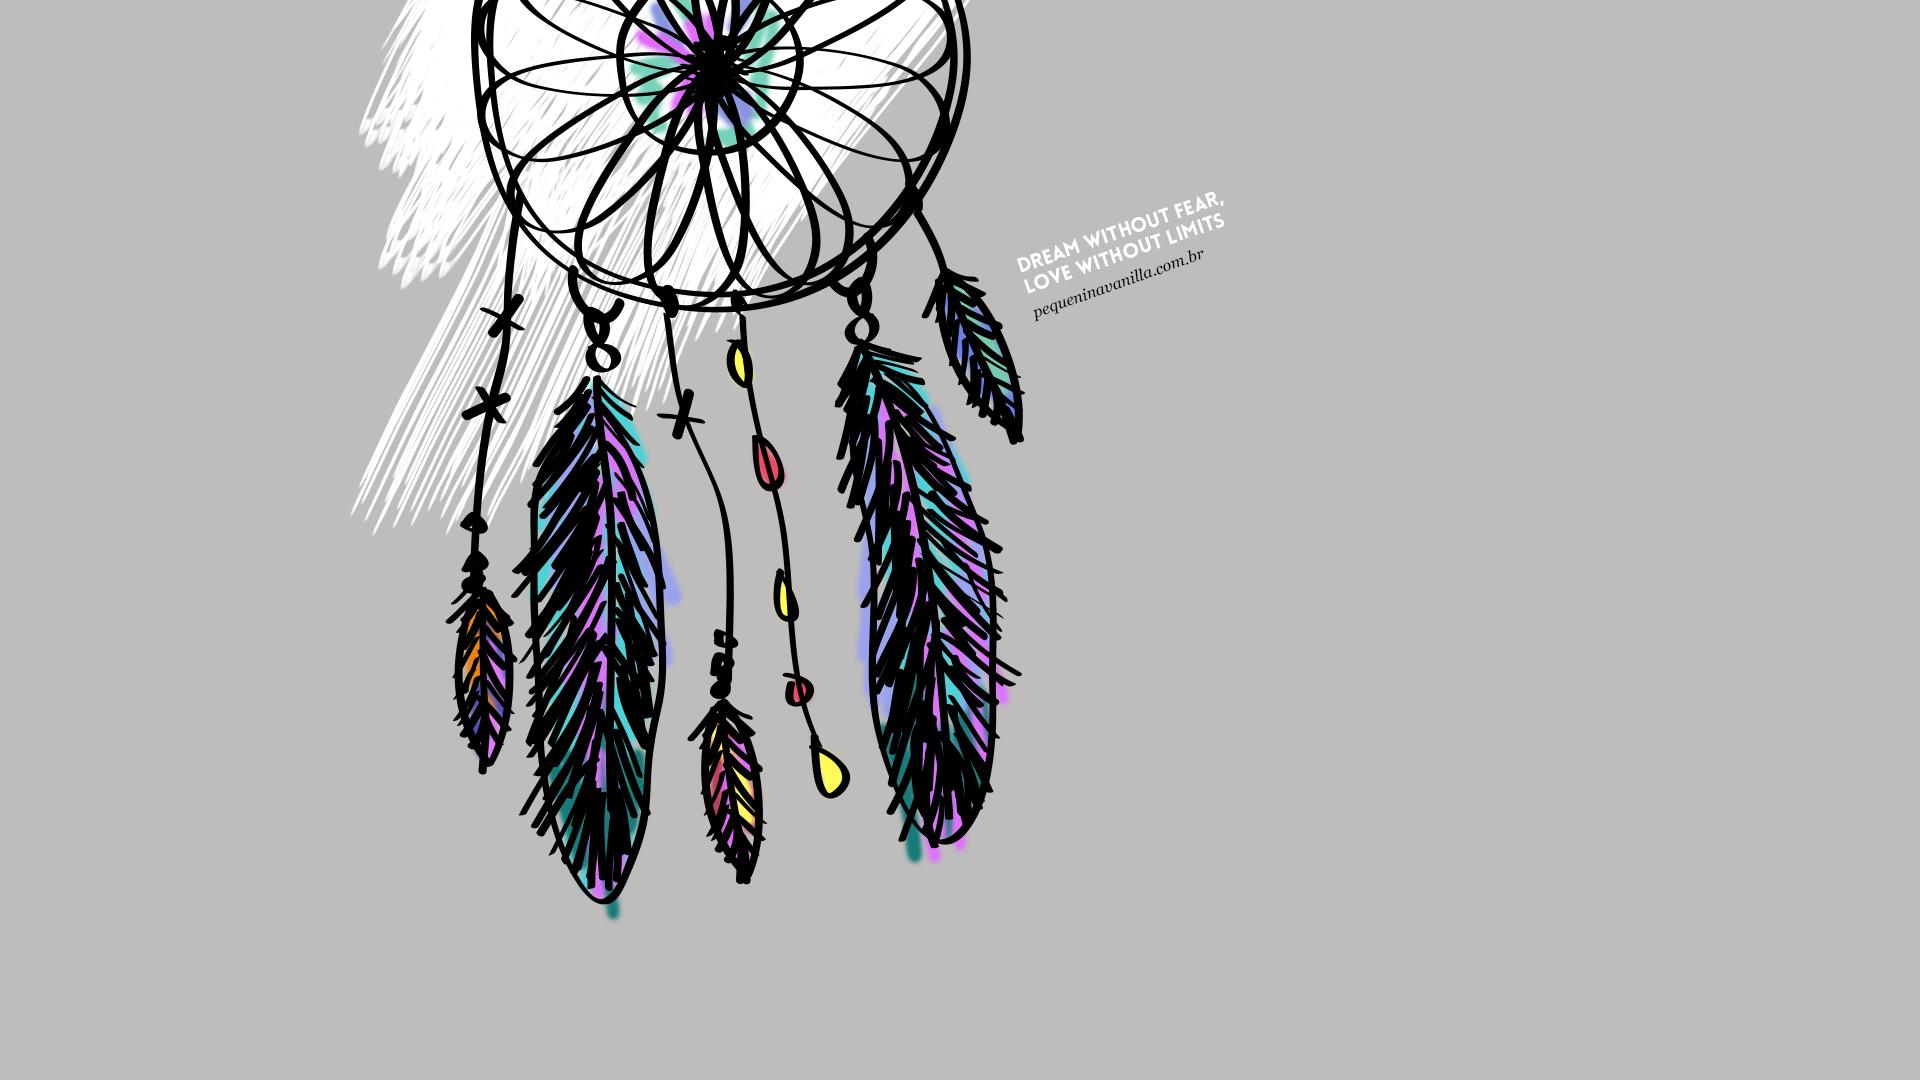 desktop backgrounds tumblr karis sticken co rh karis sticken co